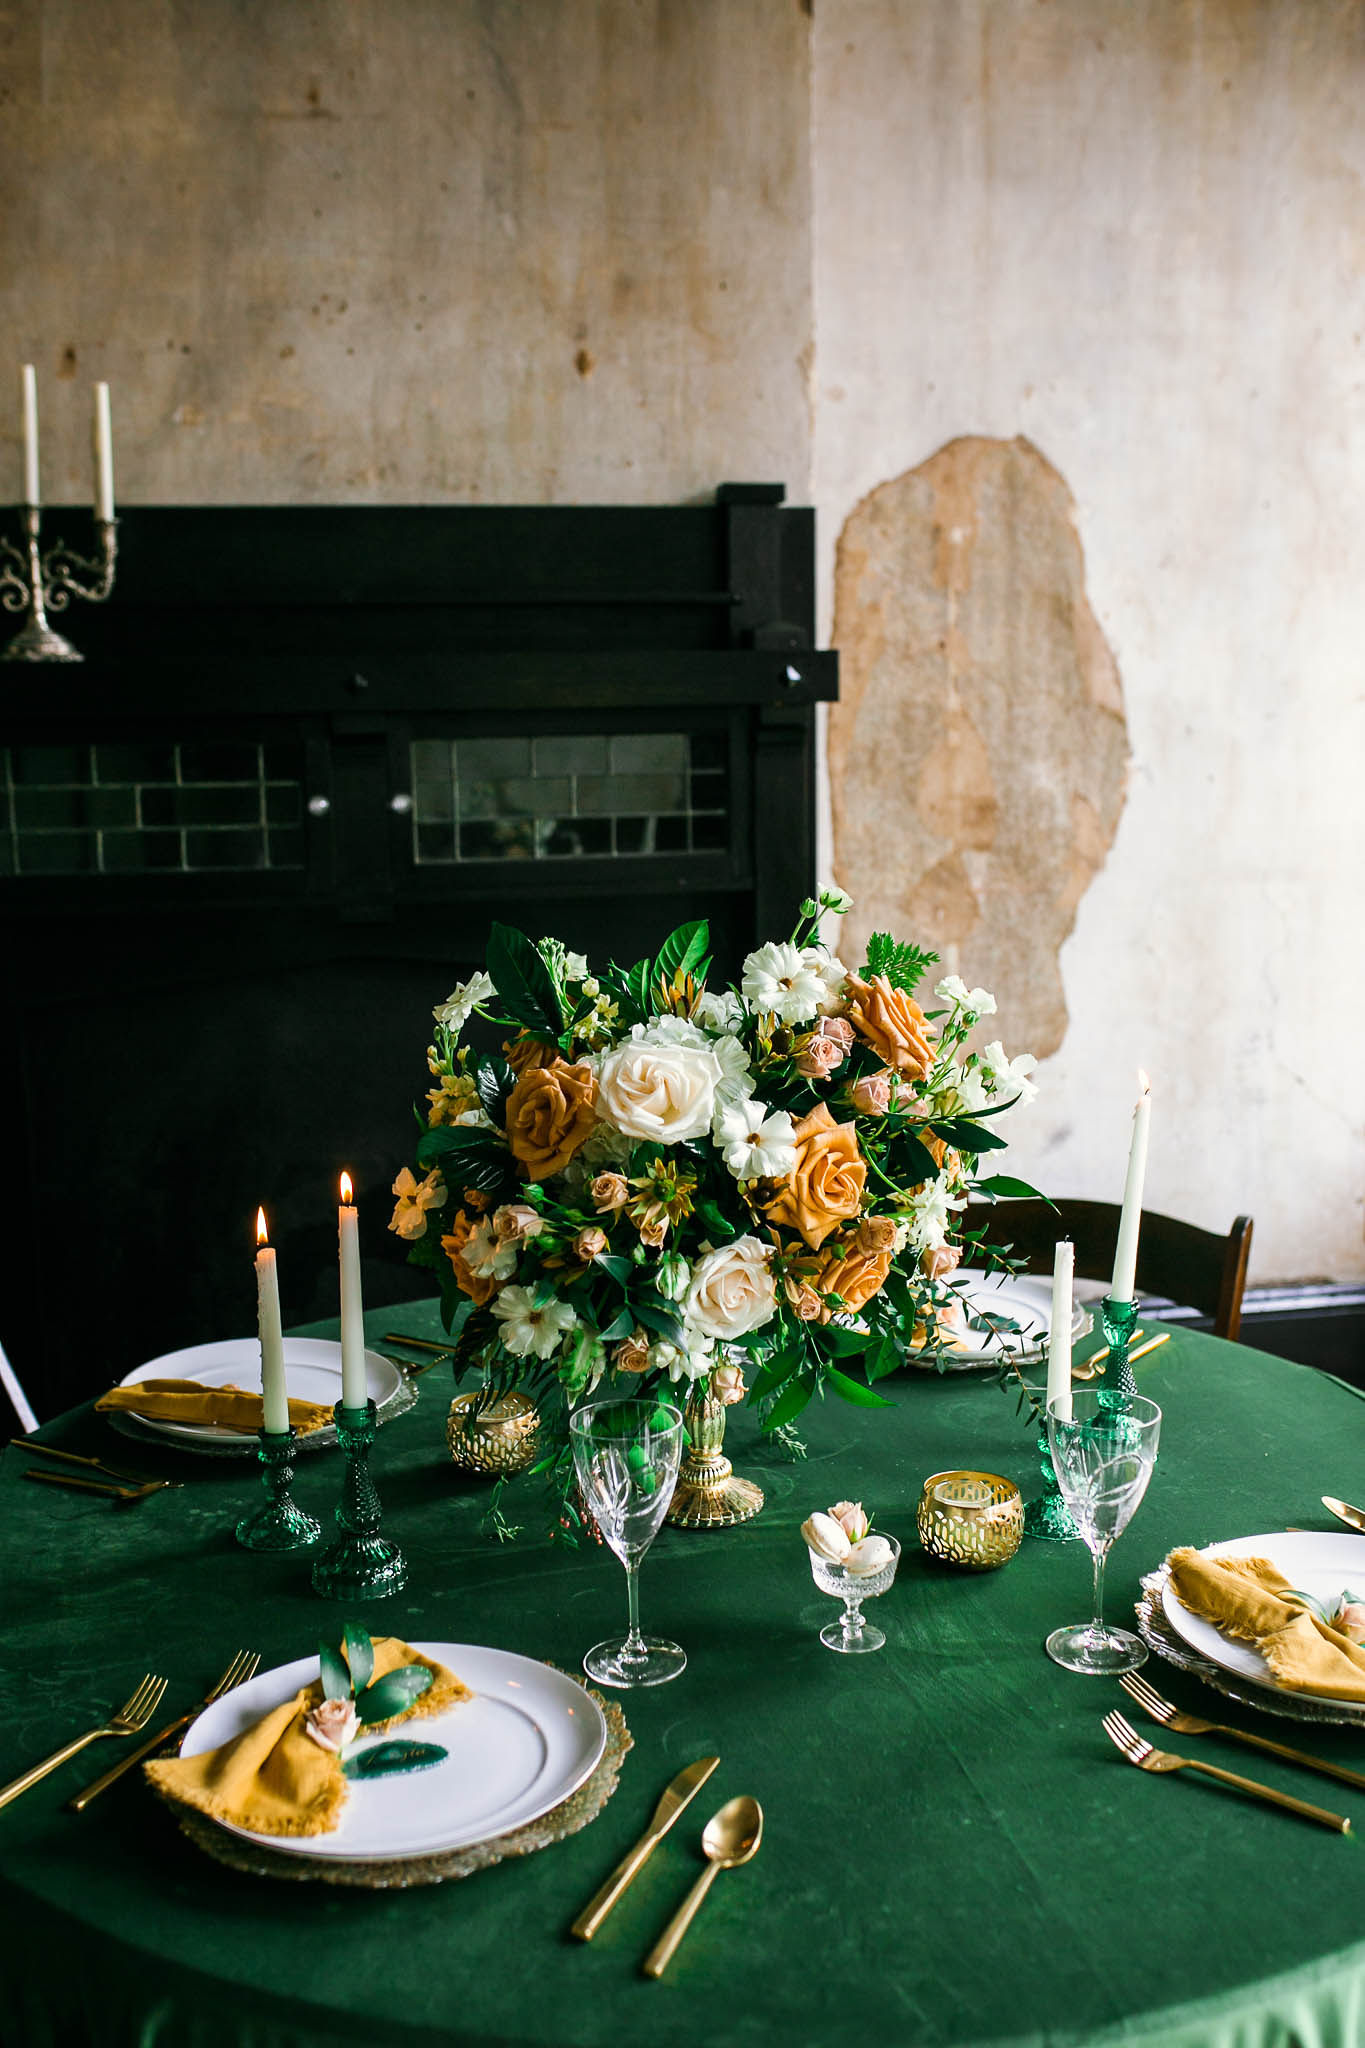 JohannaDyePhotography-EmeraldCity-41.jpg